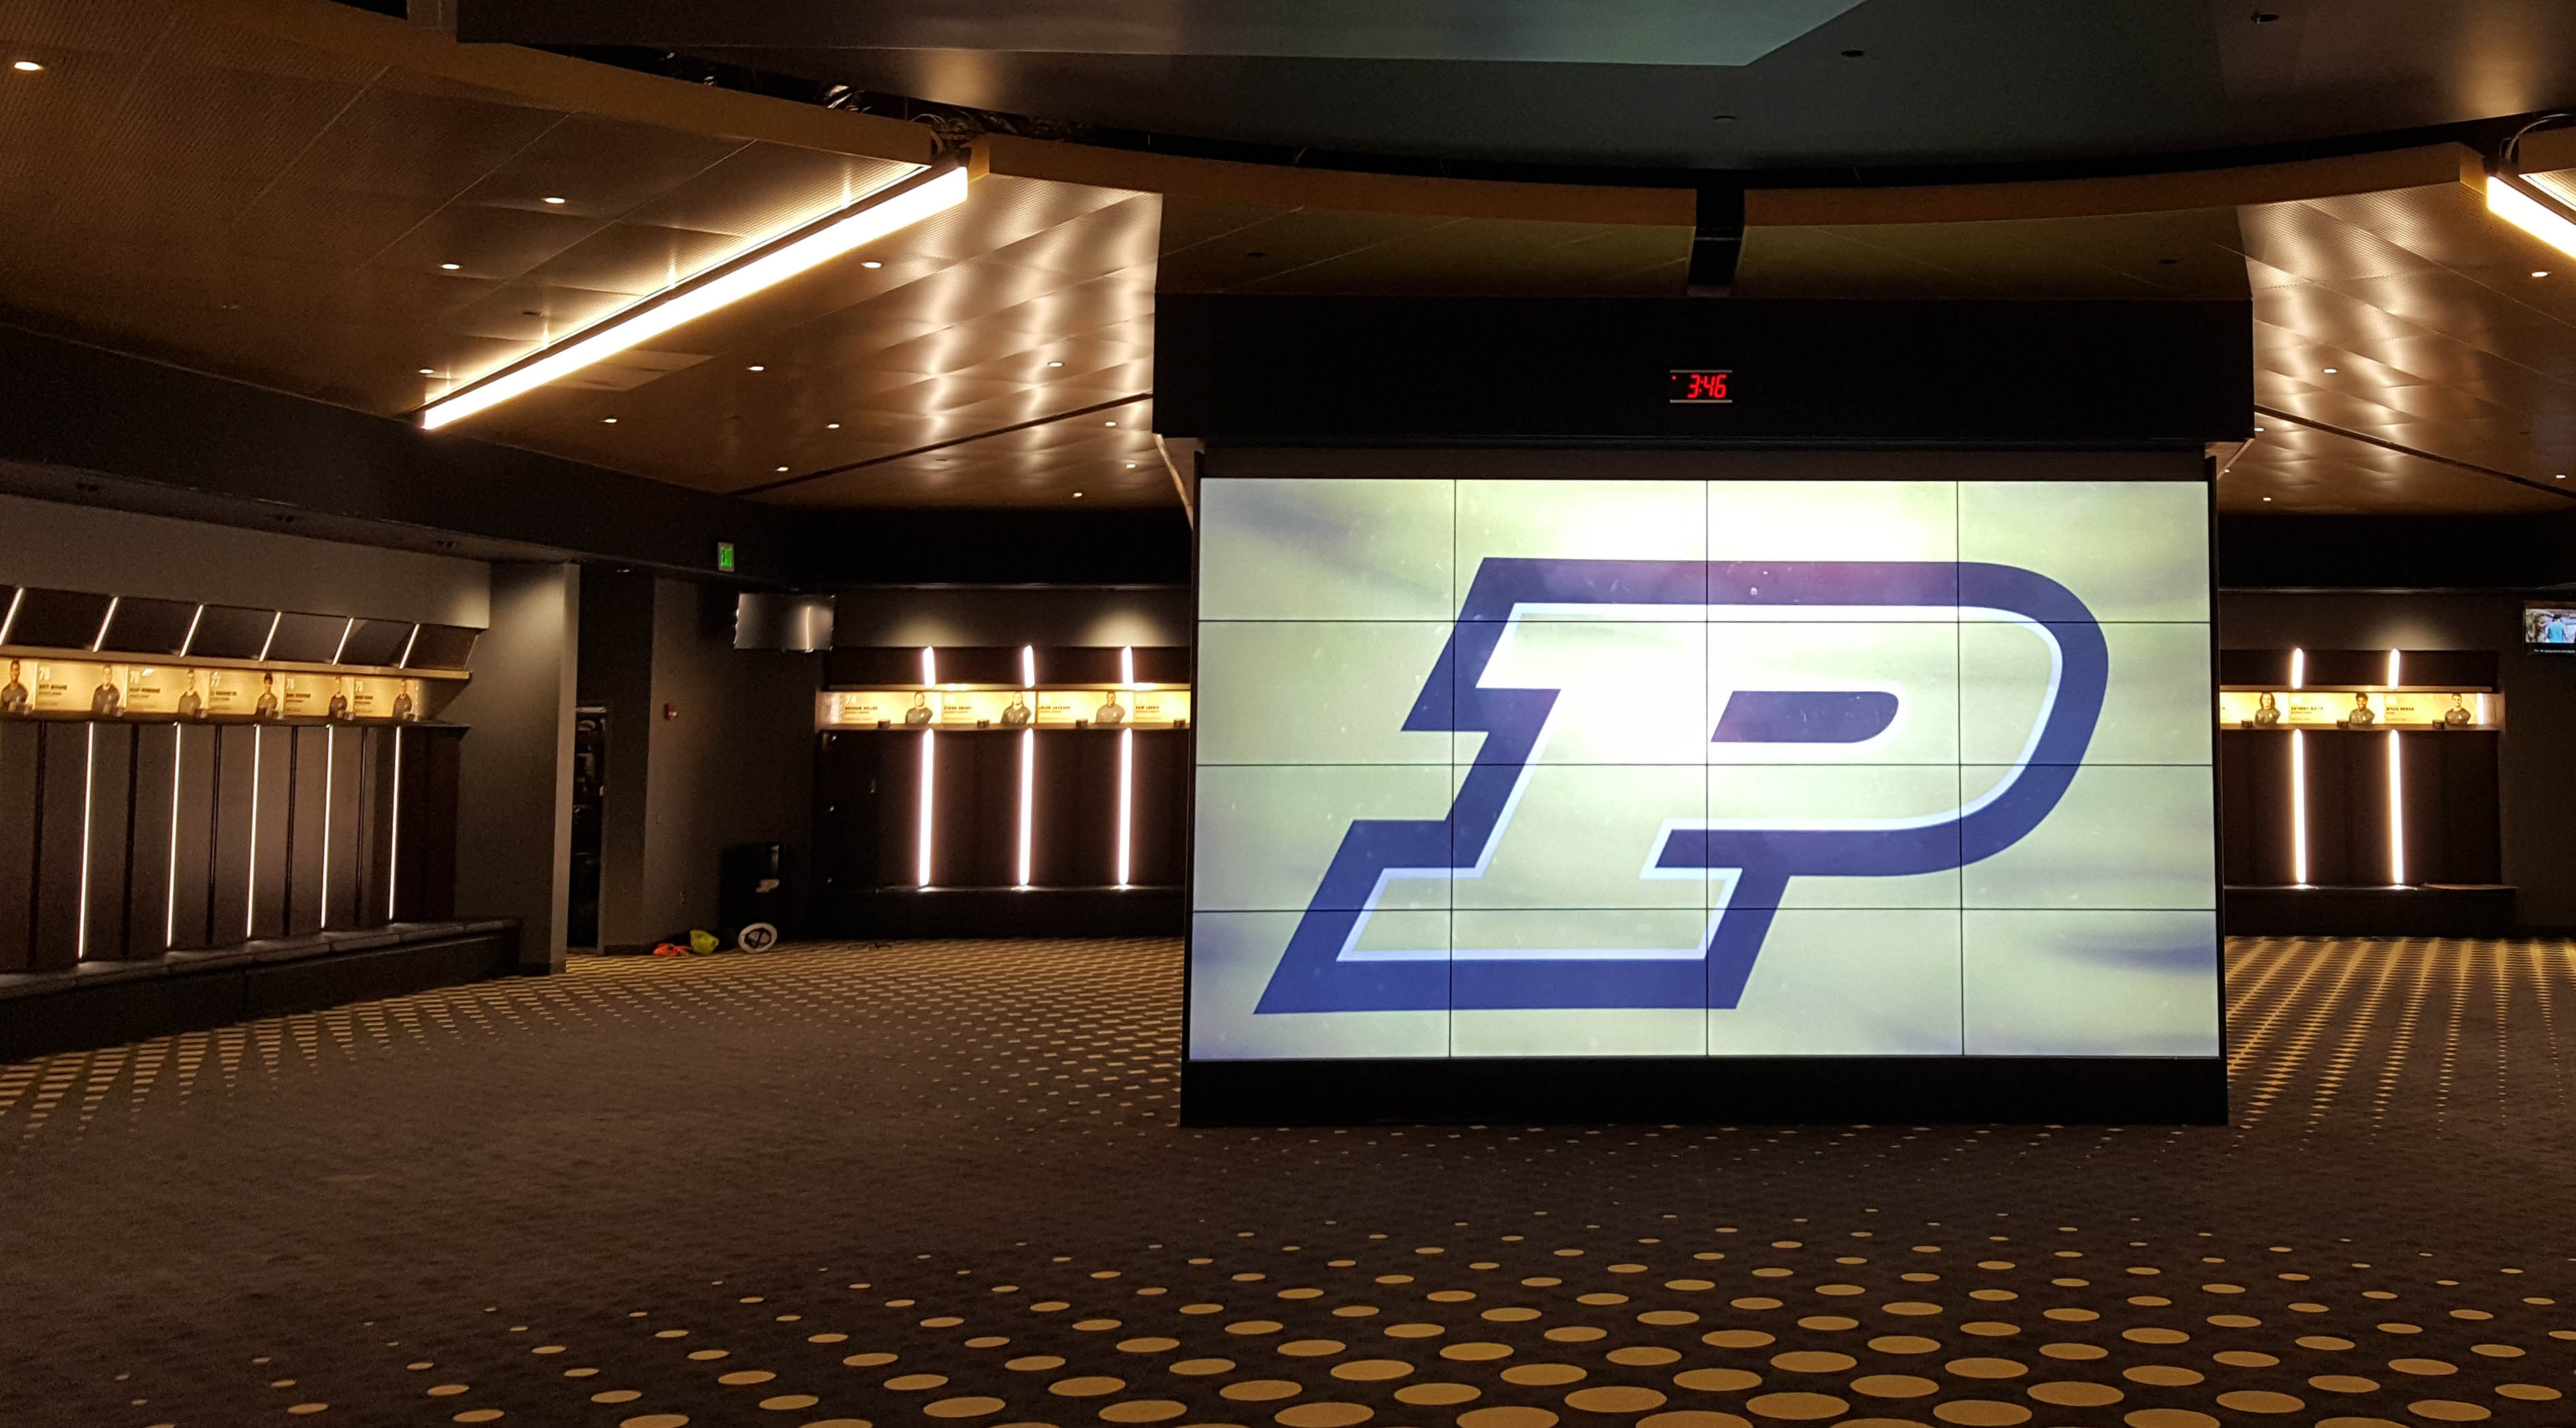 image-Purdue-University-Performance-Complex